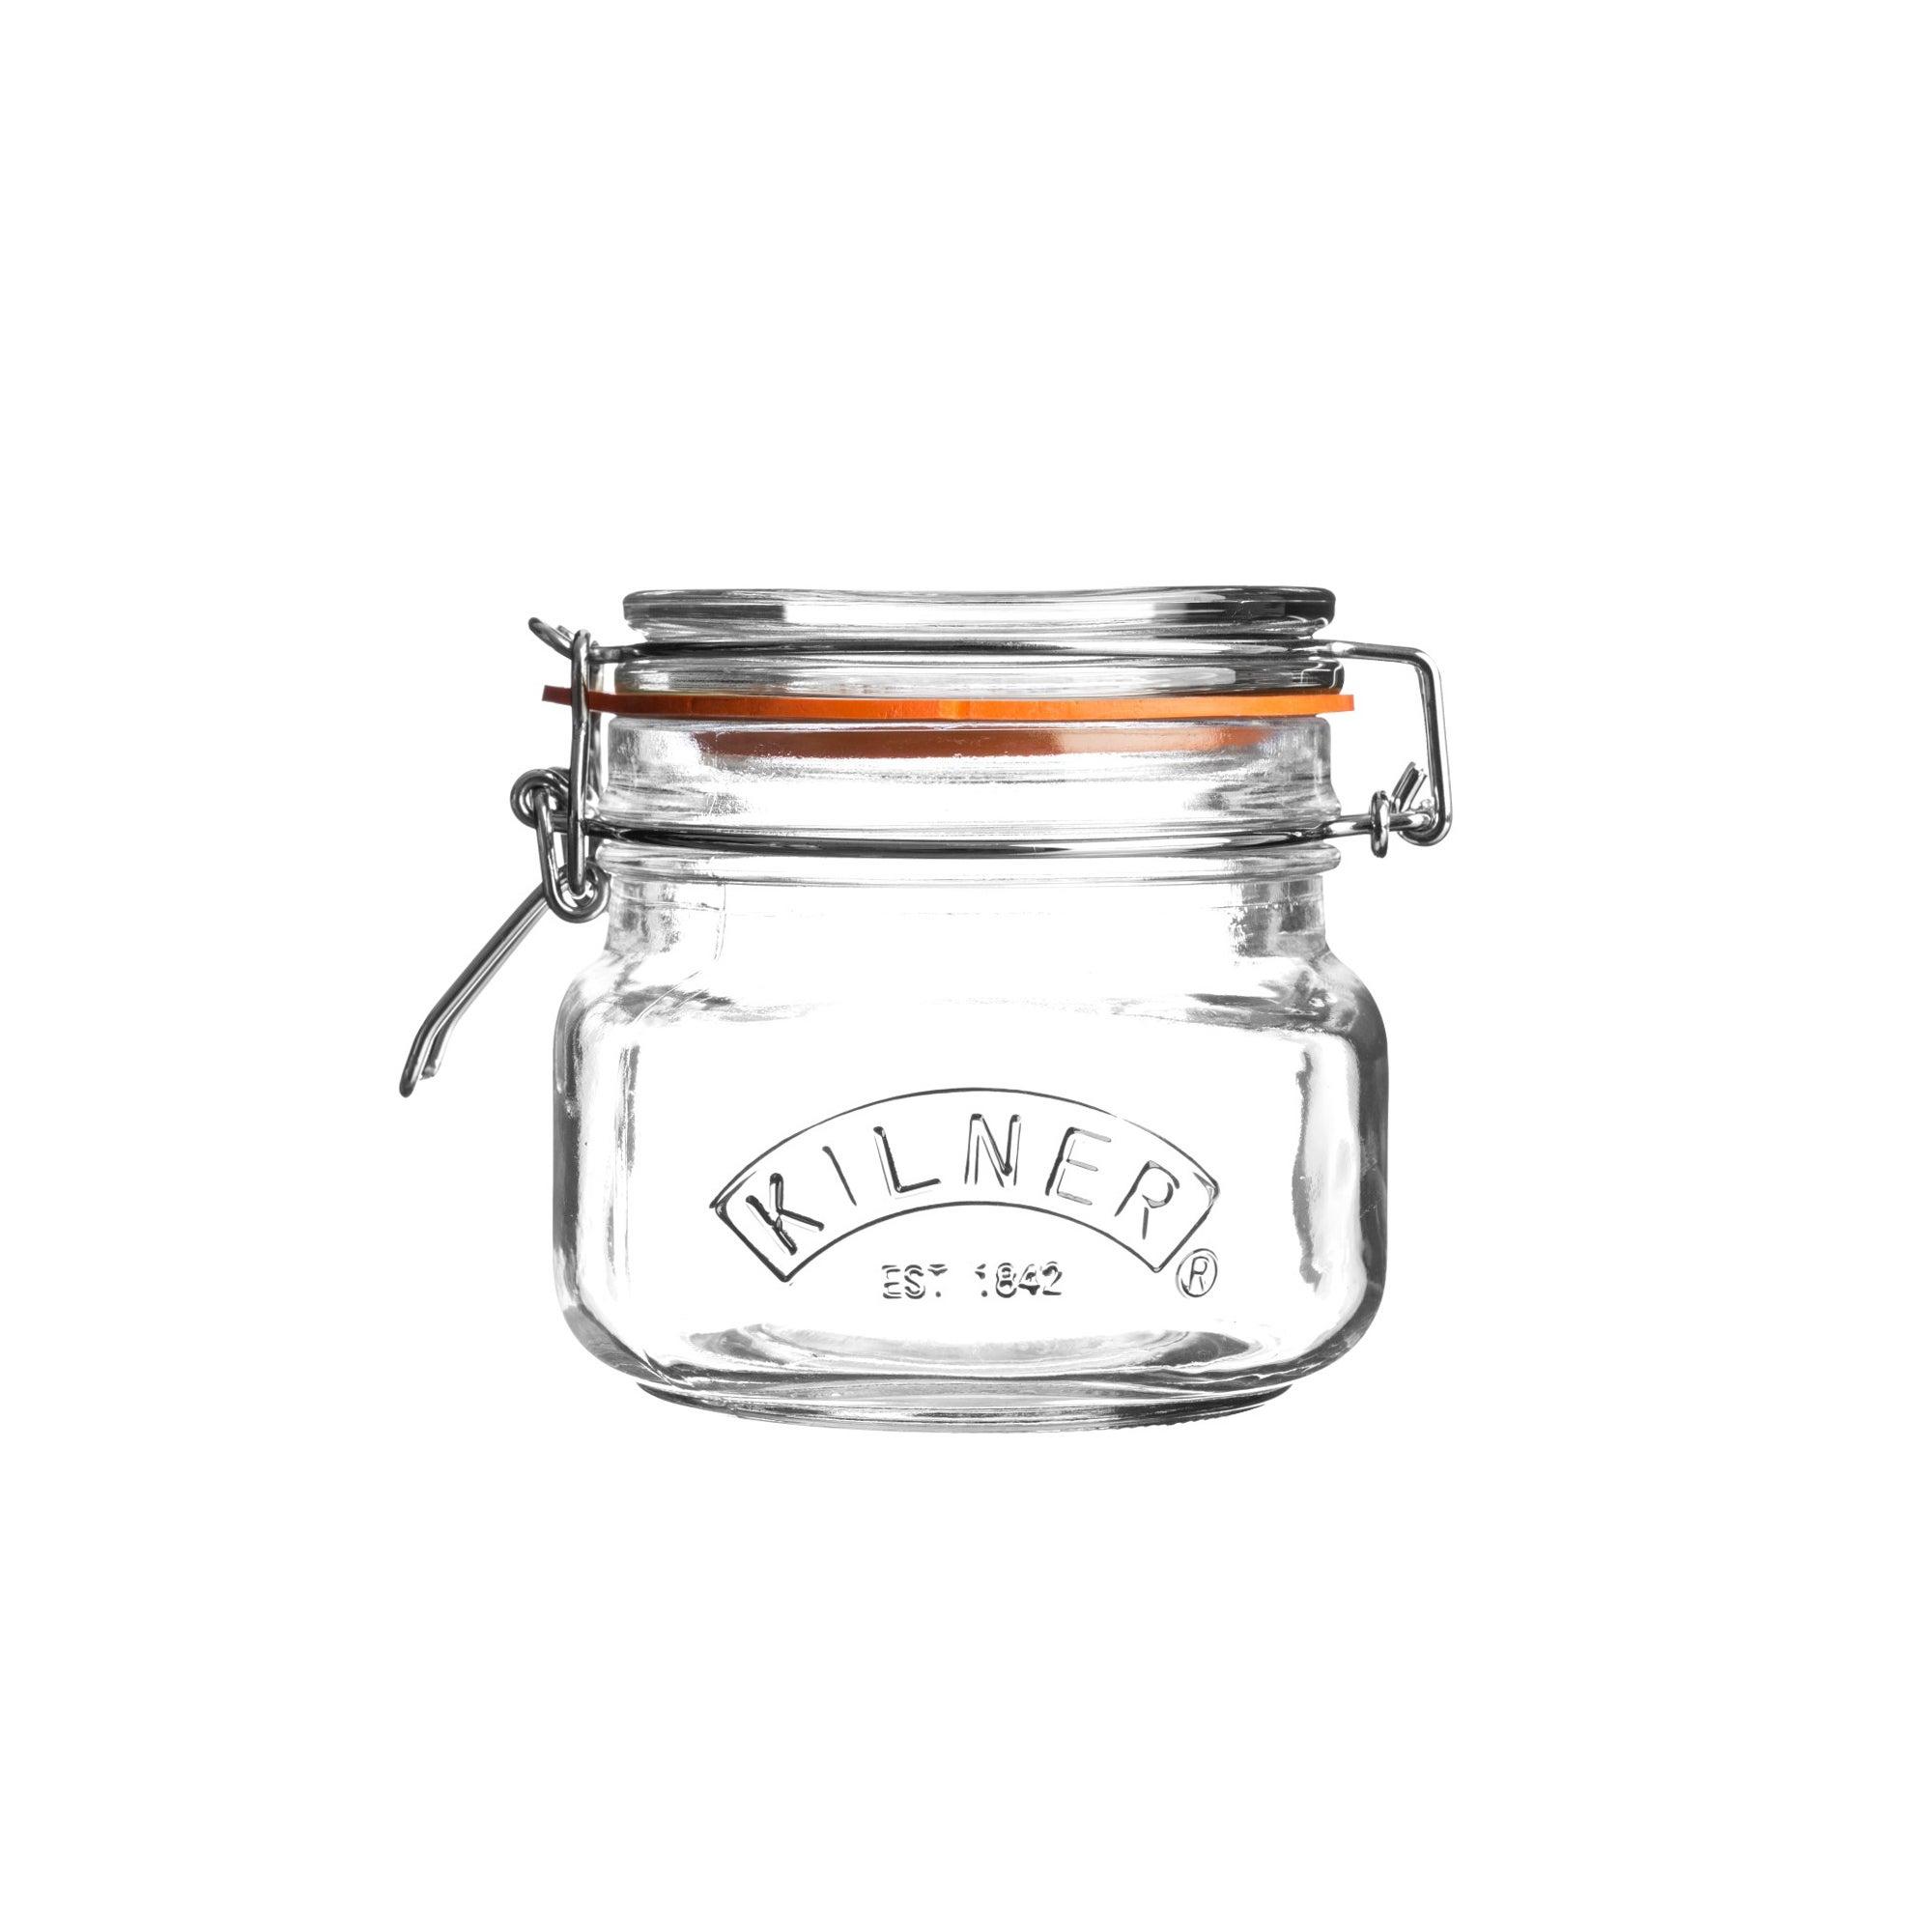 Kilner 0.5 Litres Clip Top Glass Jar